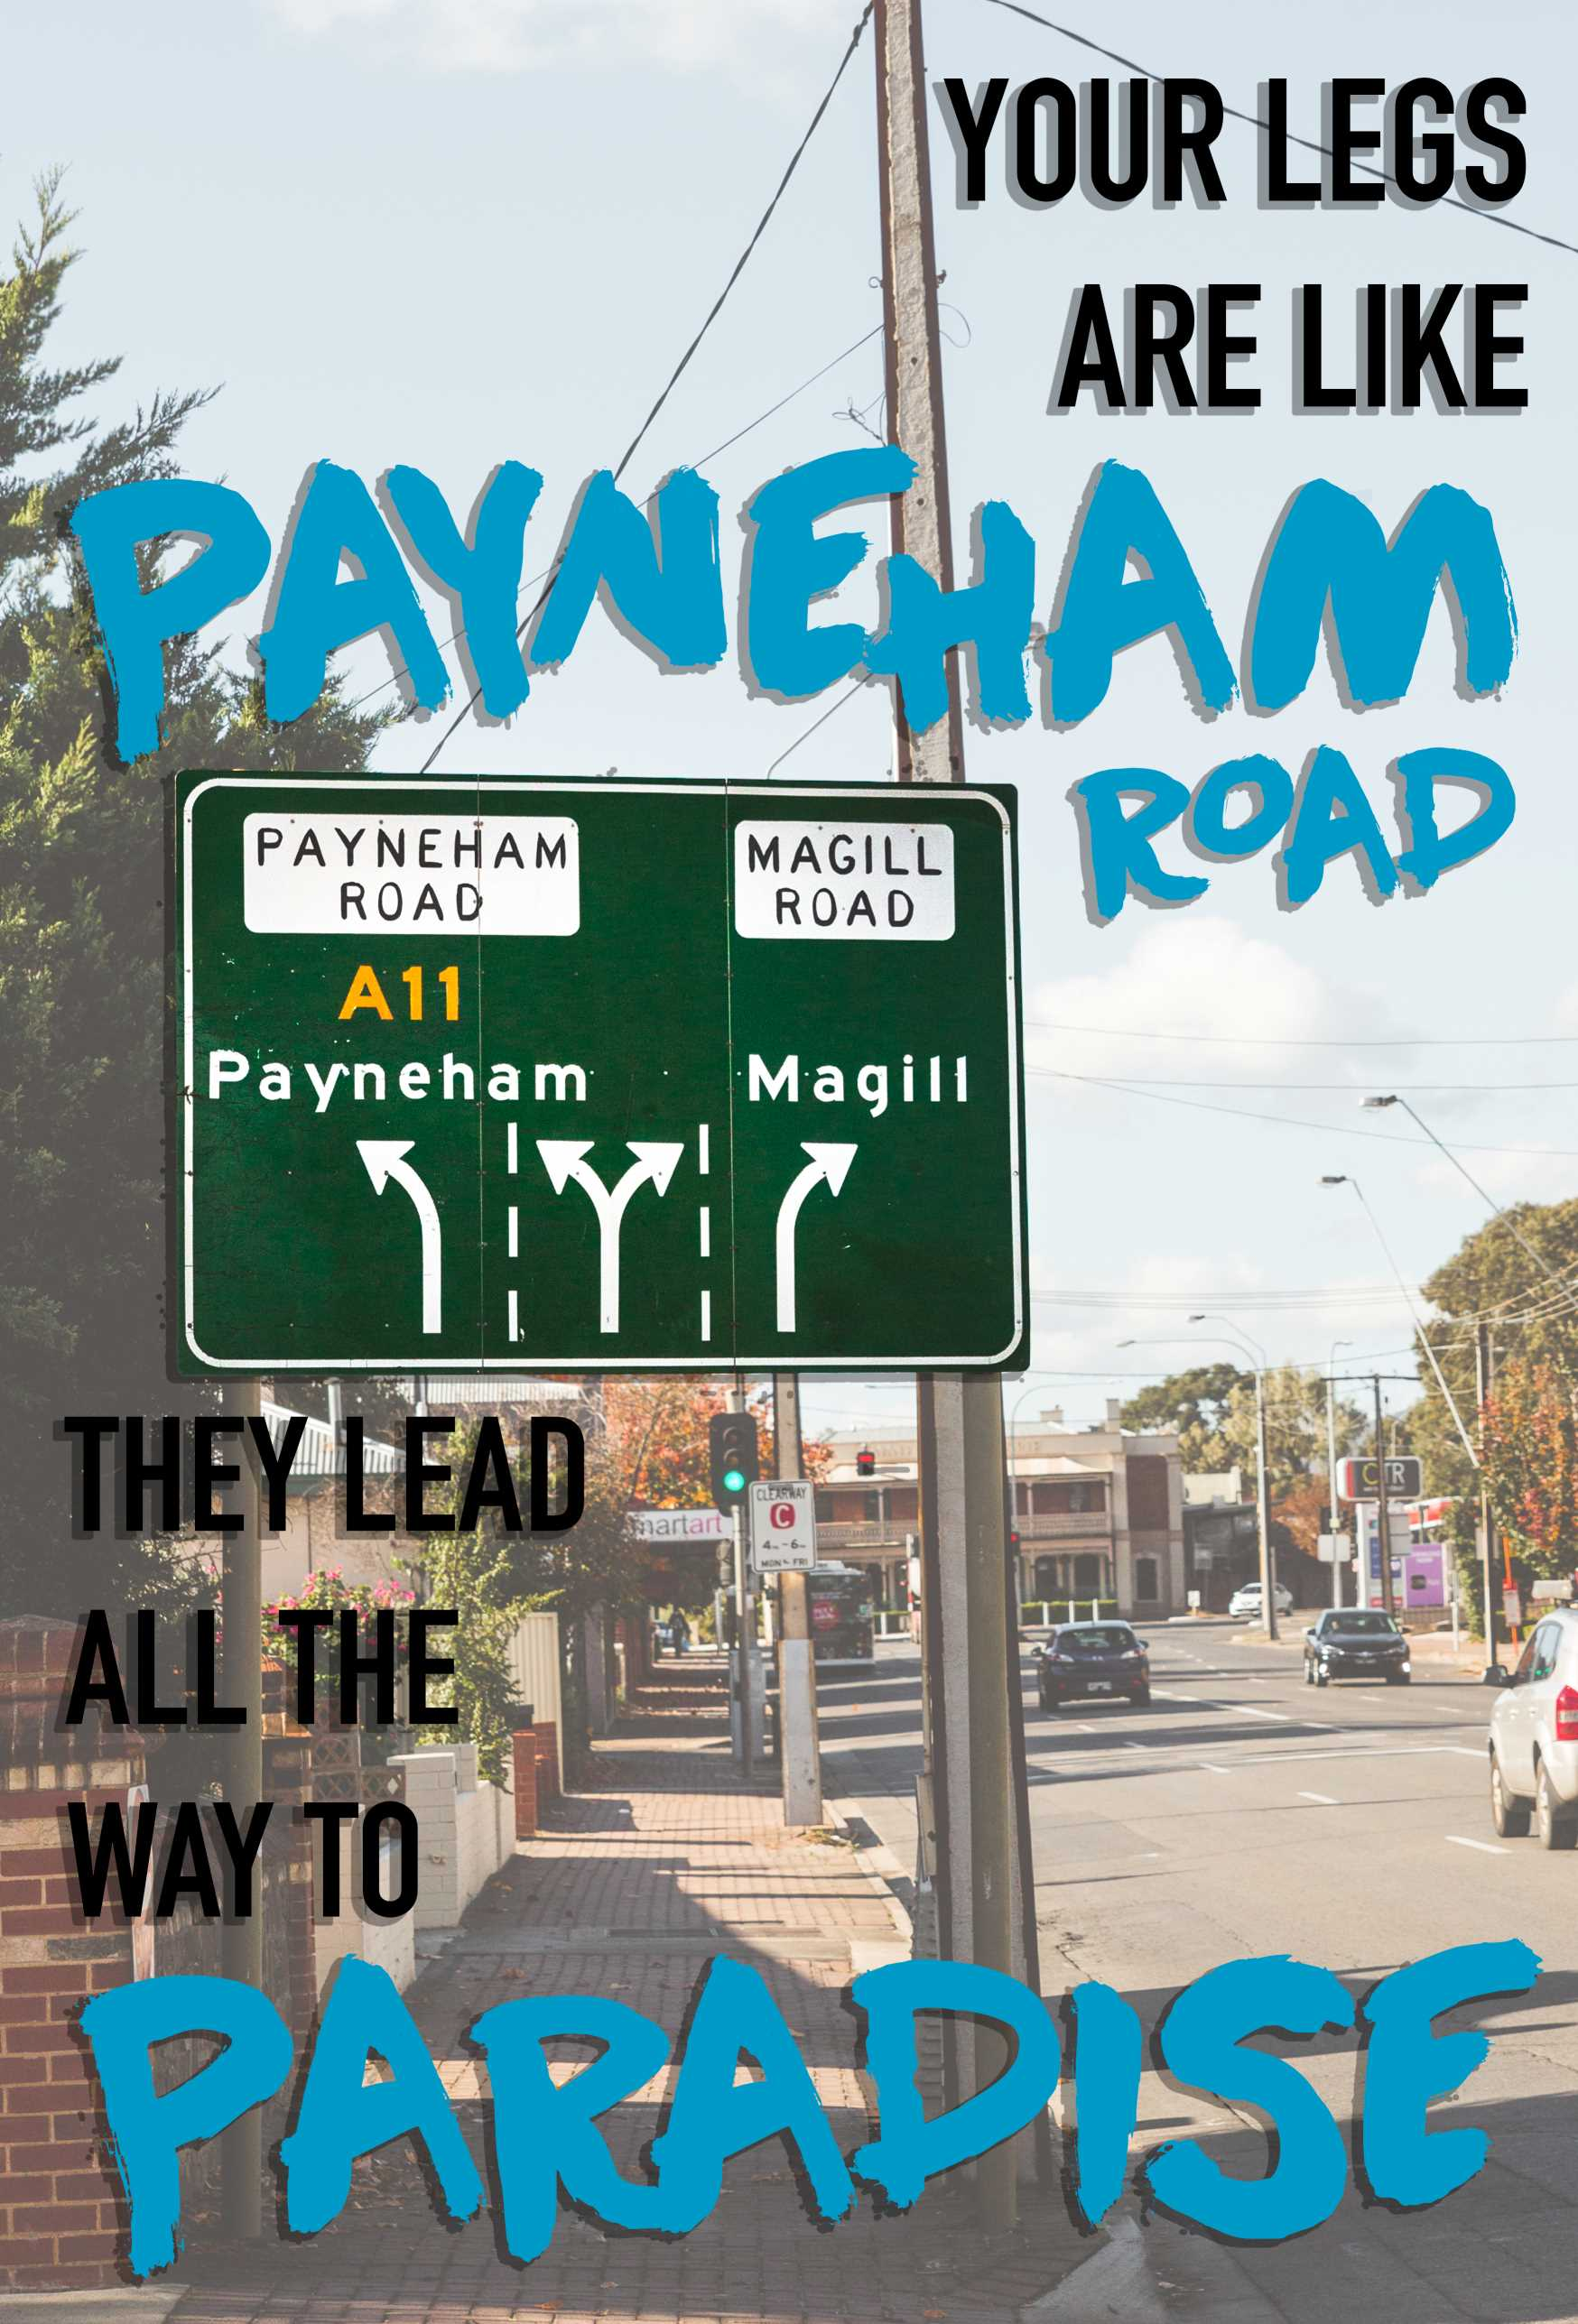 PAYNEHAM ROAD